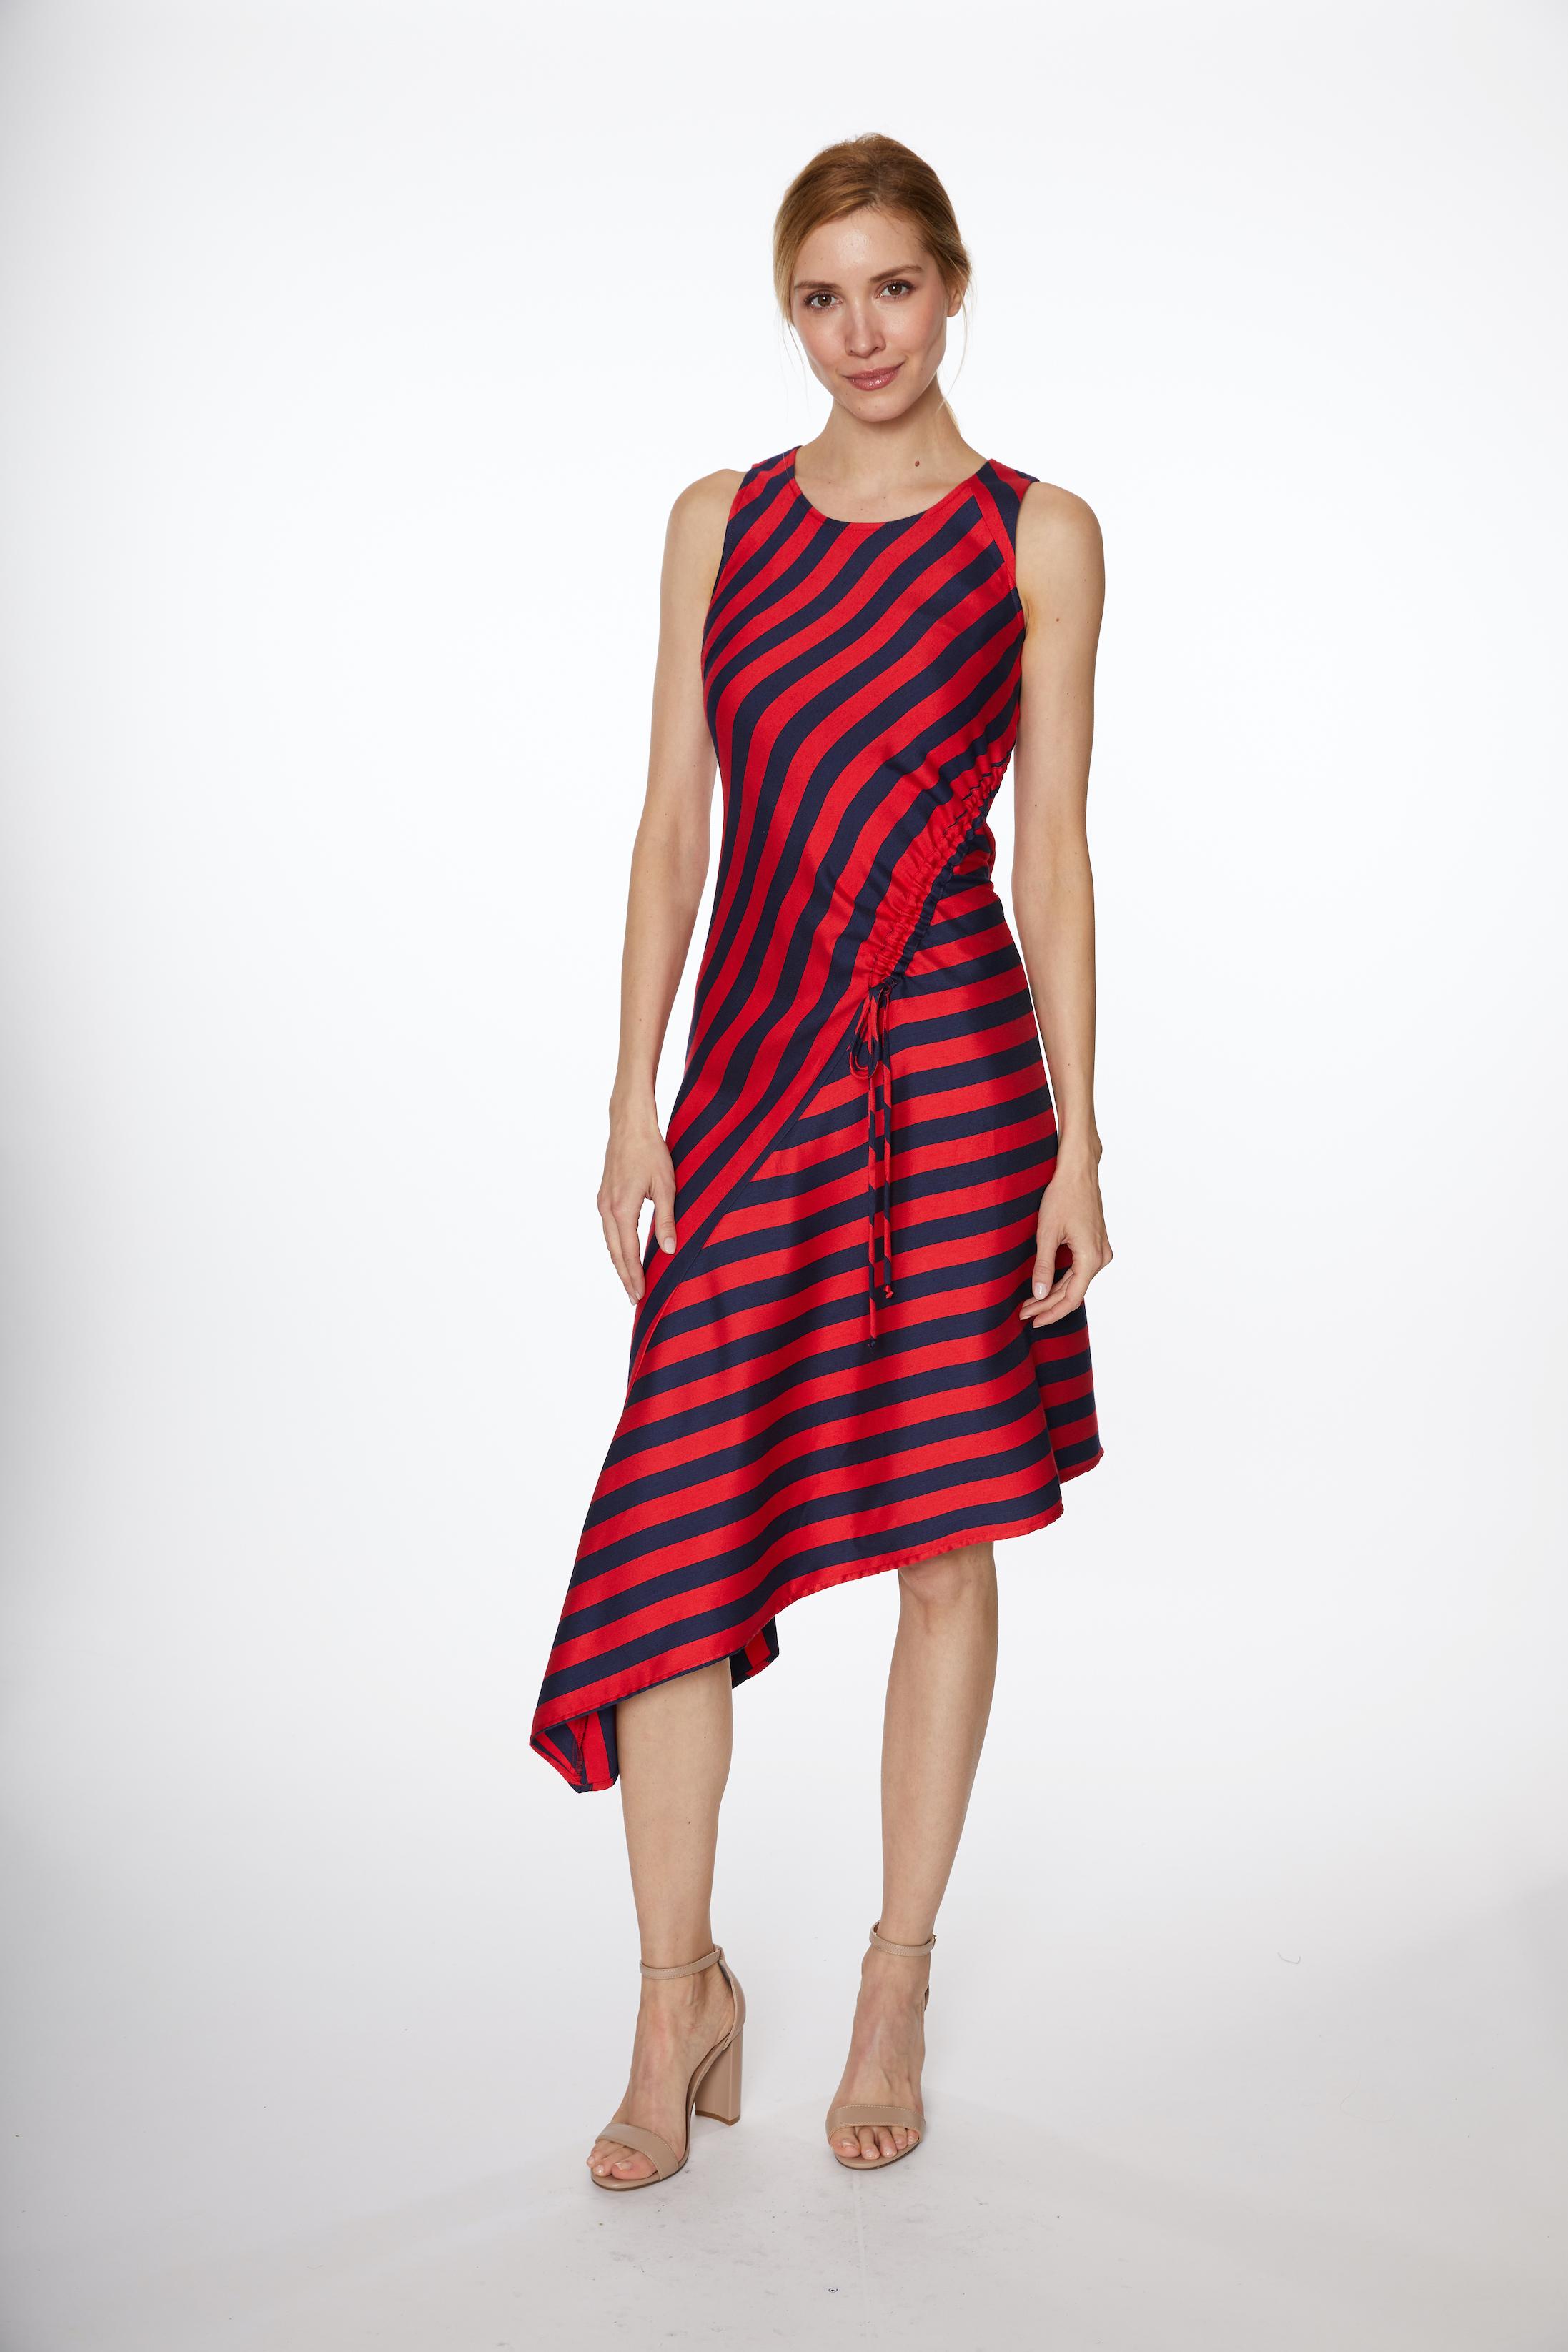 Asymmetrical Stripe Drawstring Dress -Navy/Red - Front